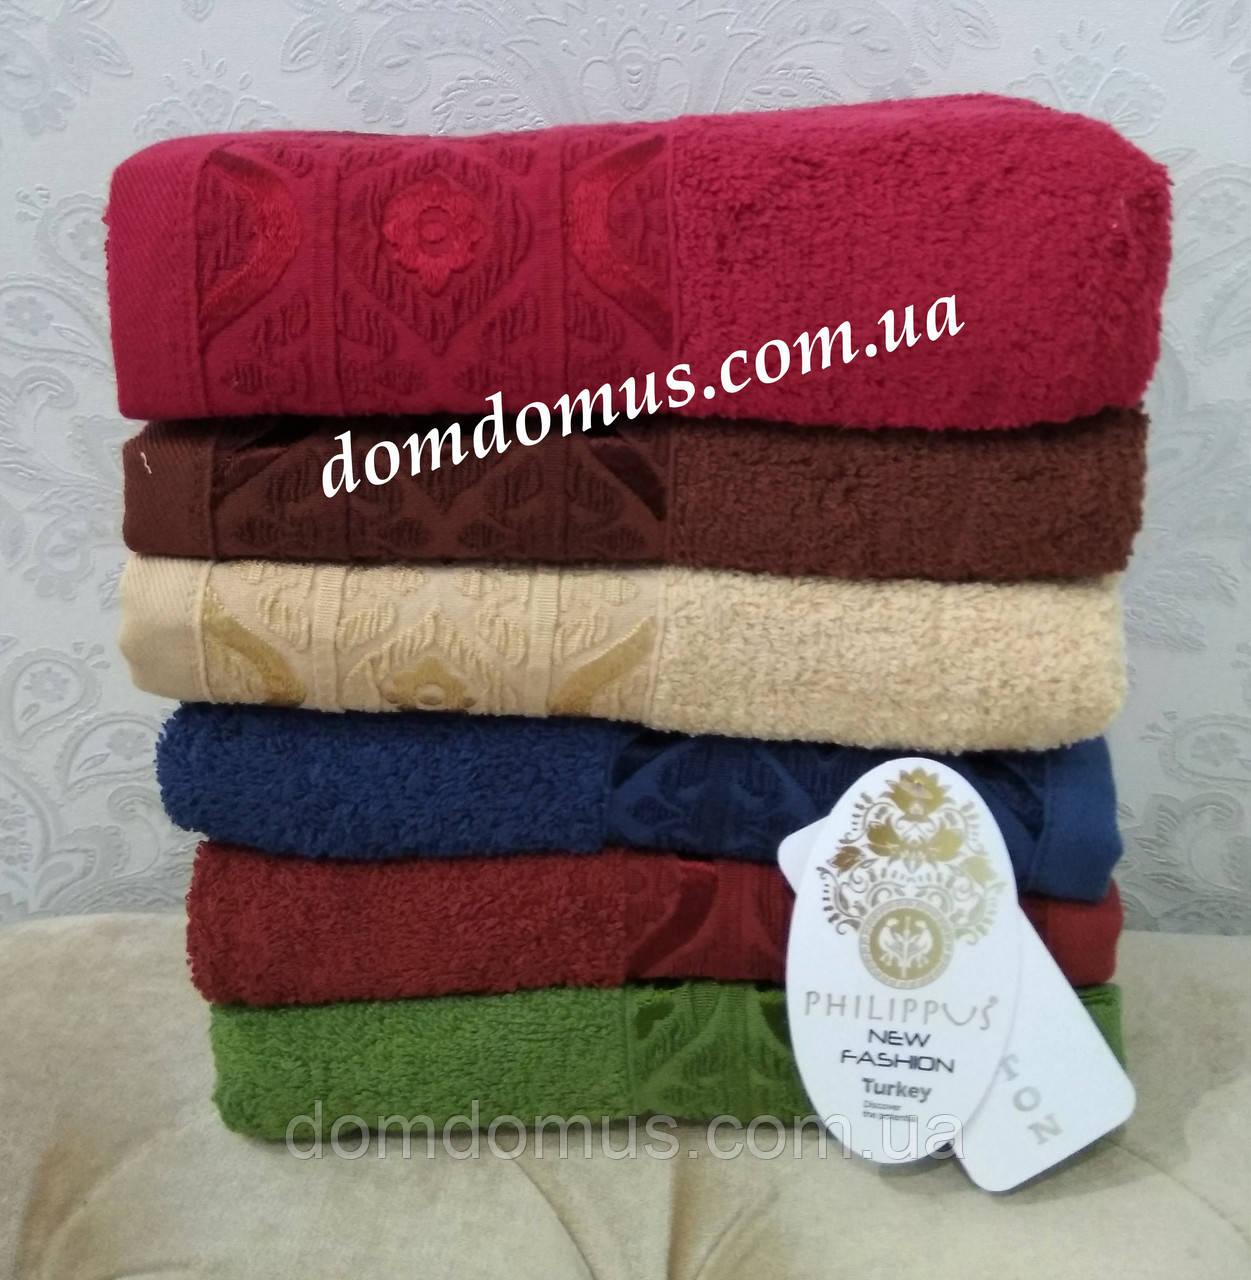 "Махровое полотенце ""Devina"" 50*90 см,  Philippus 6 шт./уп, Турция"